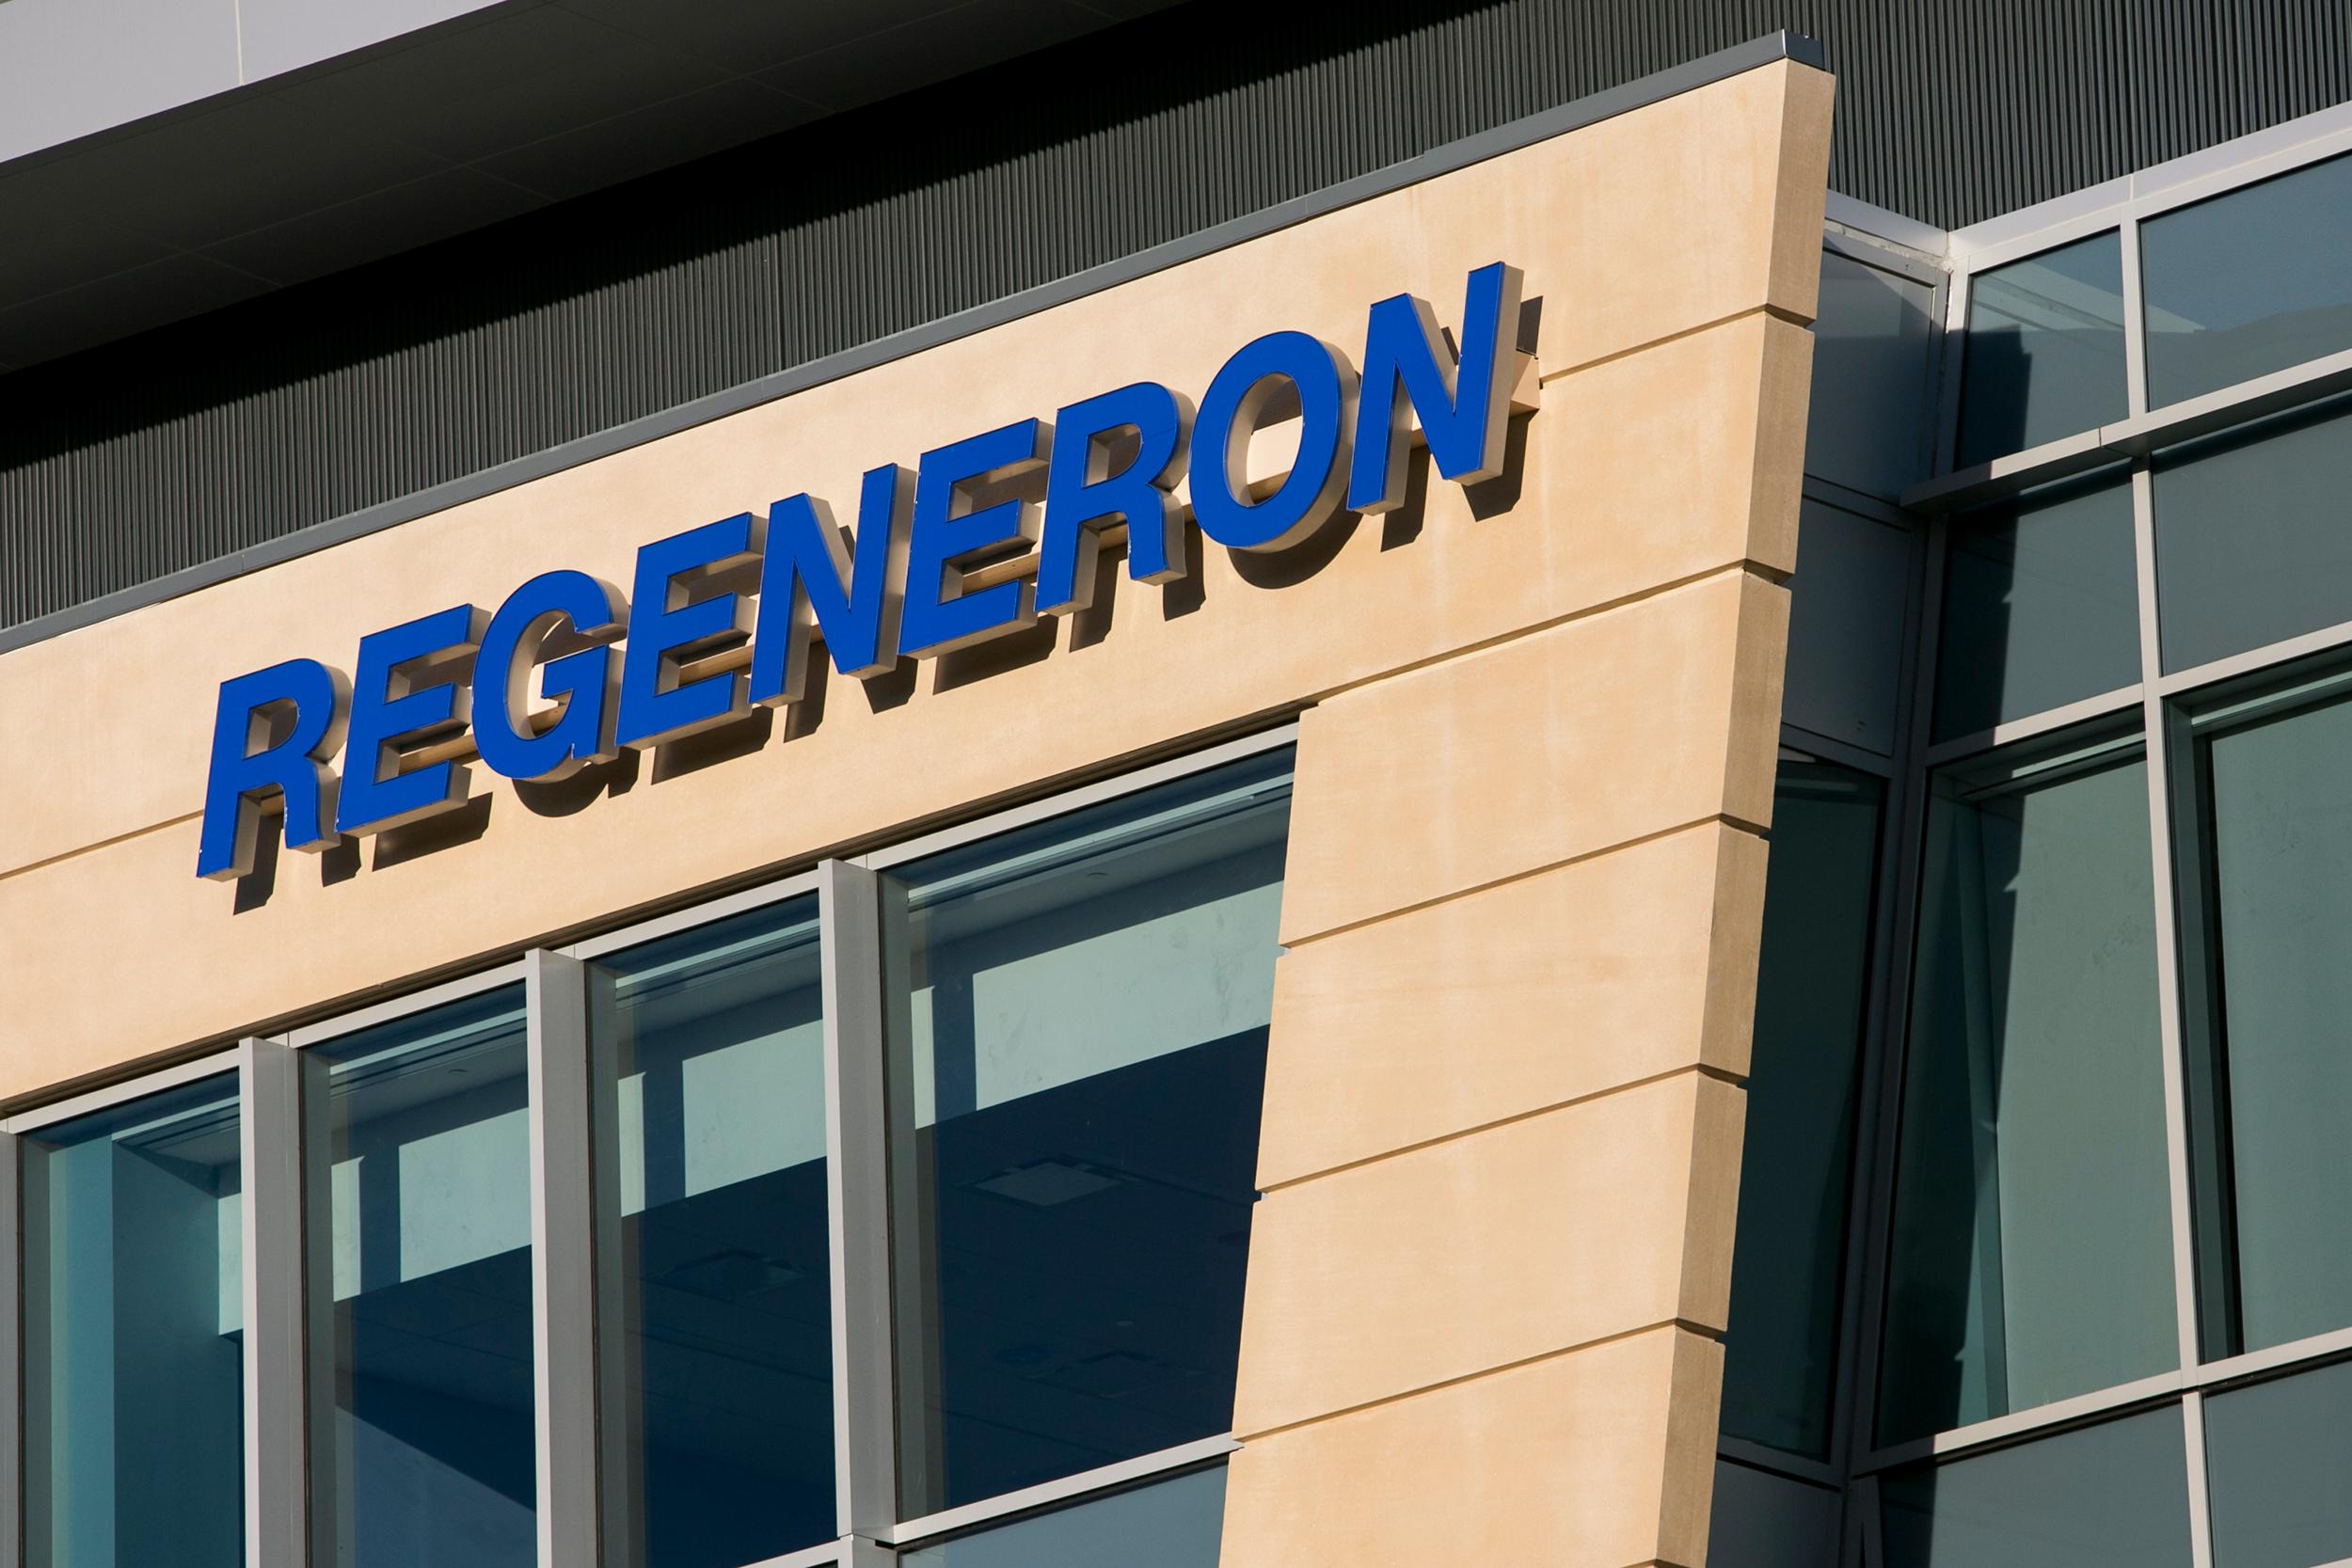 Regeneron Pharmaceuticals, Inc. headquarters in Tarrytown, New York on 2015.